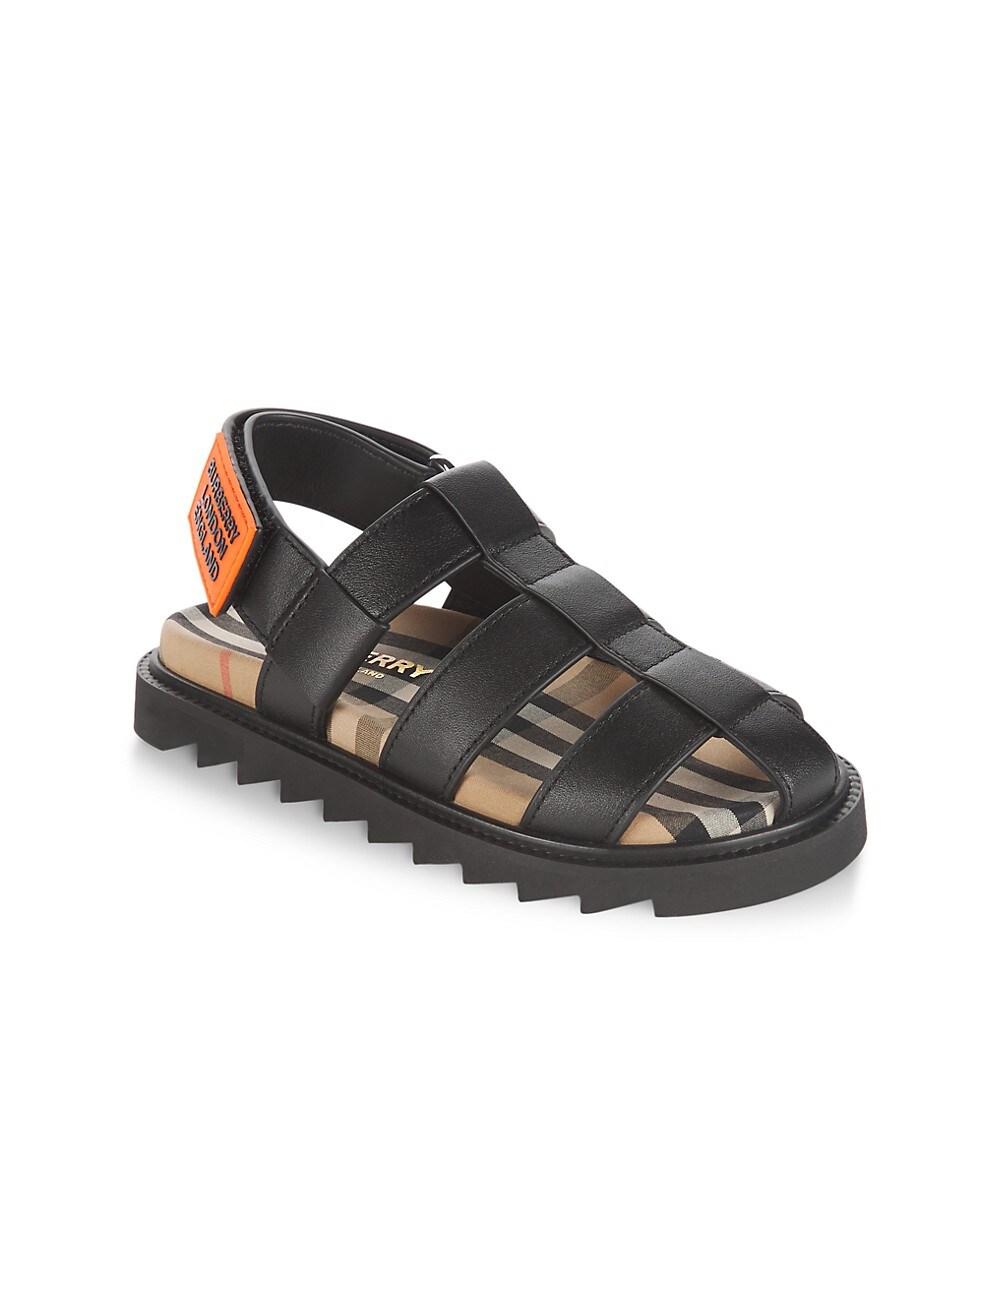 Burberry Little Kids & Kids Brightling Leather Sandals